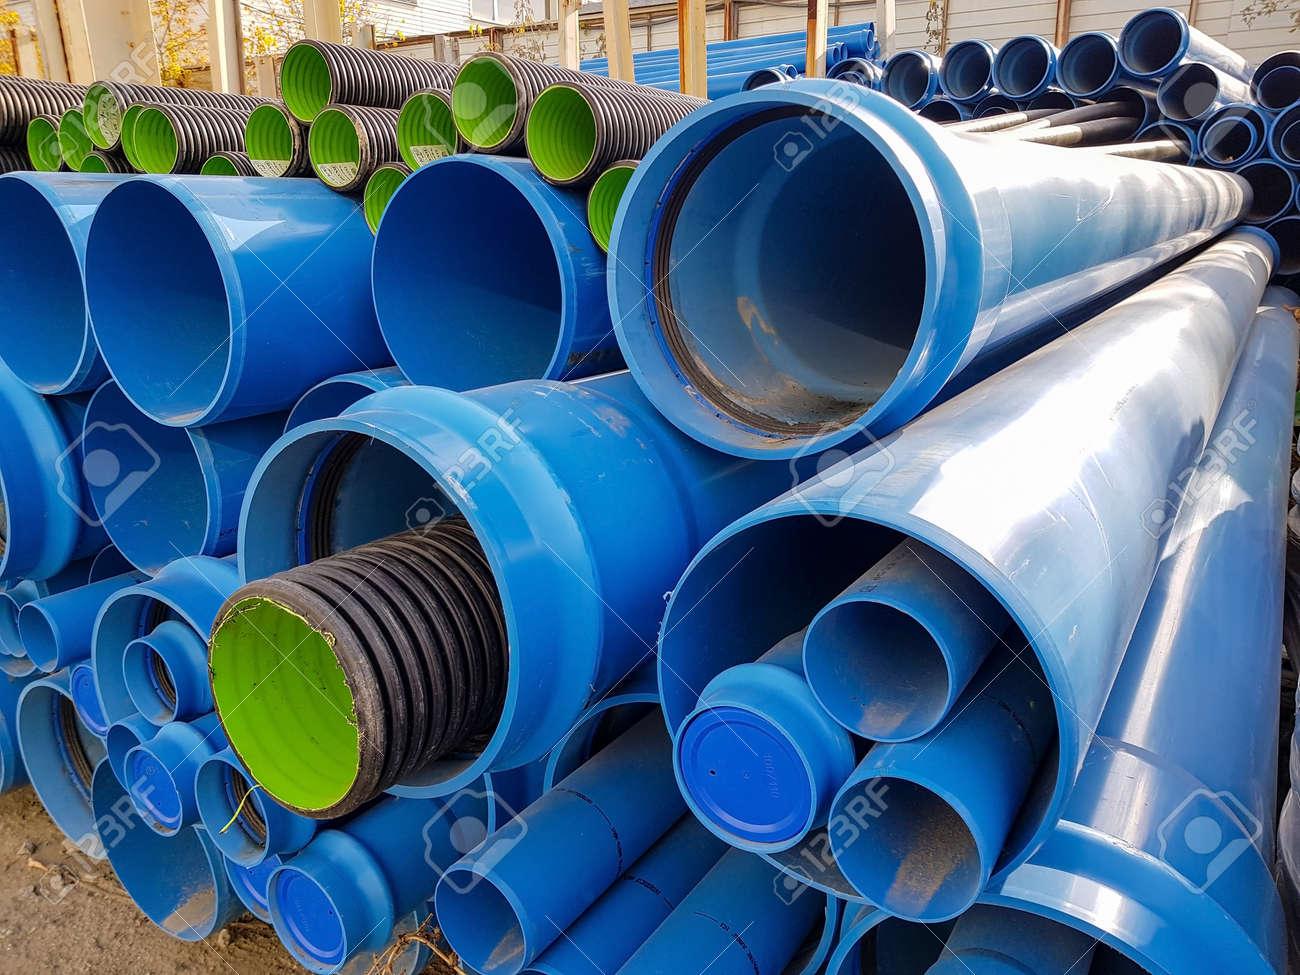 Blue PVC tubes in storage, Plastic tubes, Background of PVC - 136805223